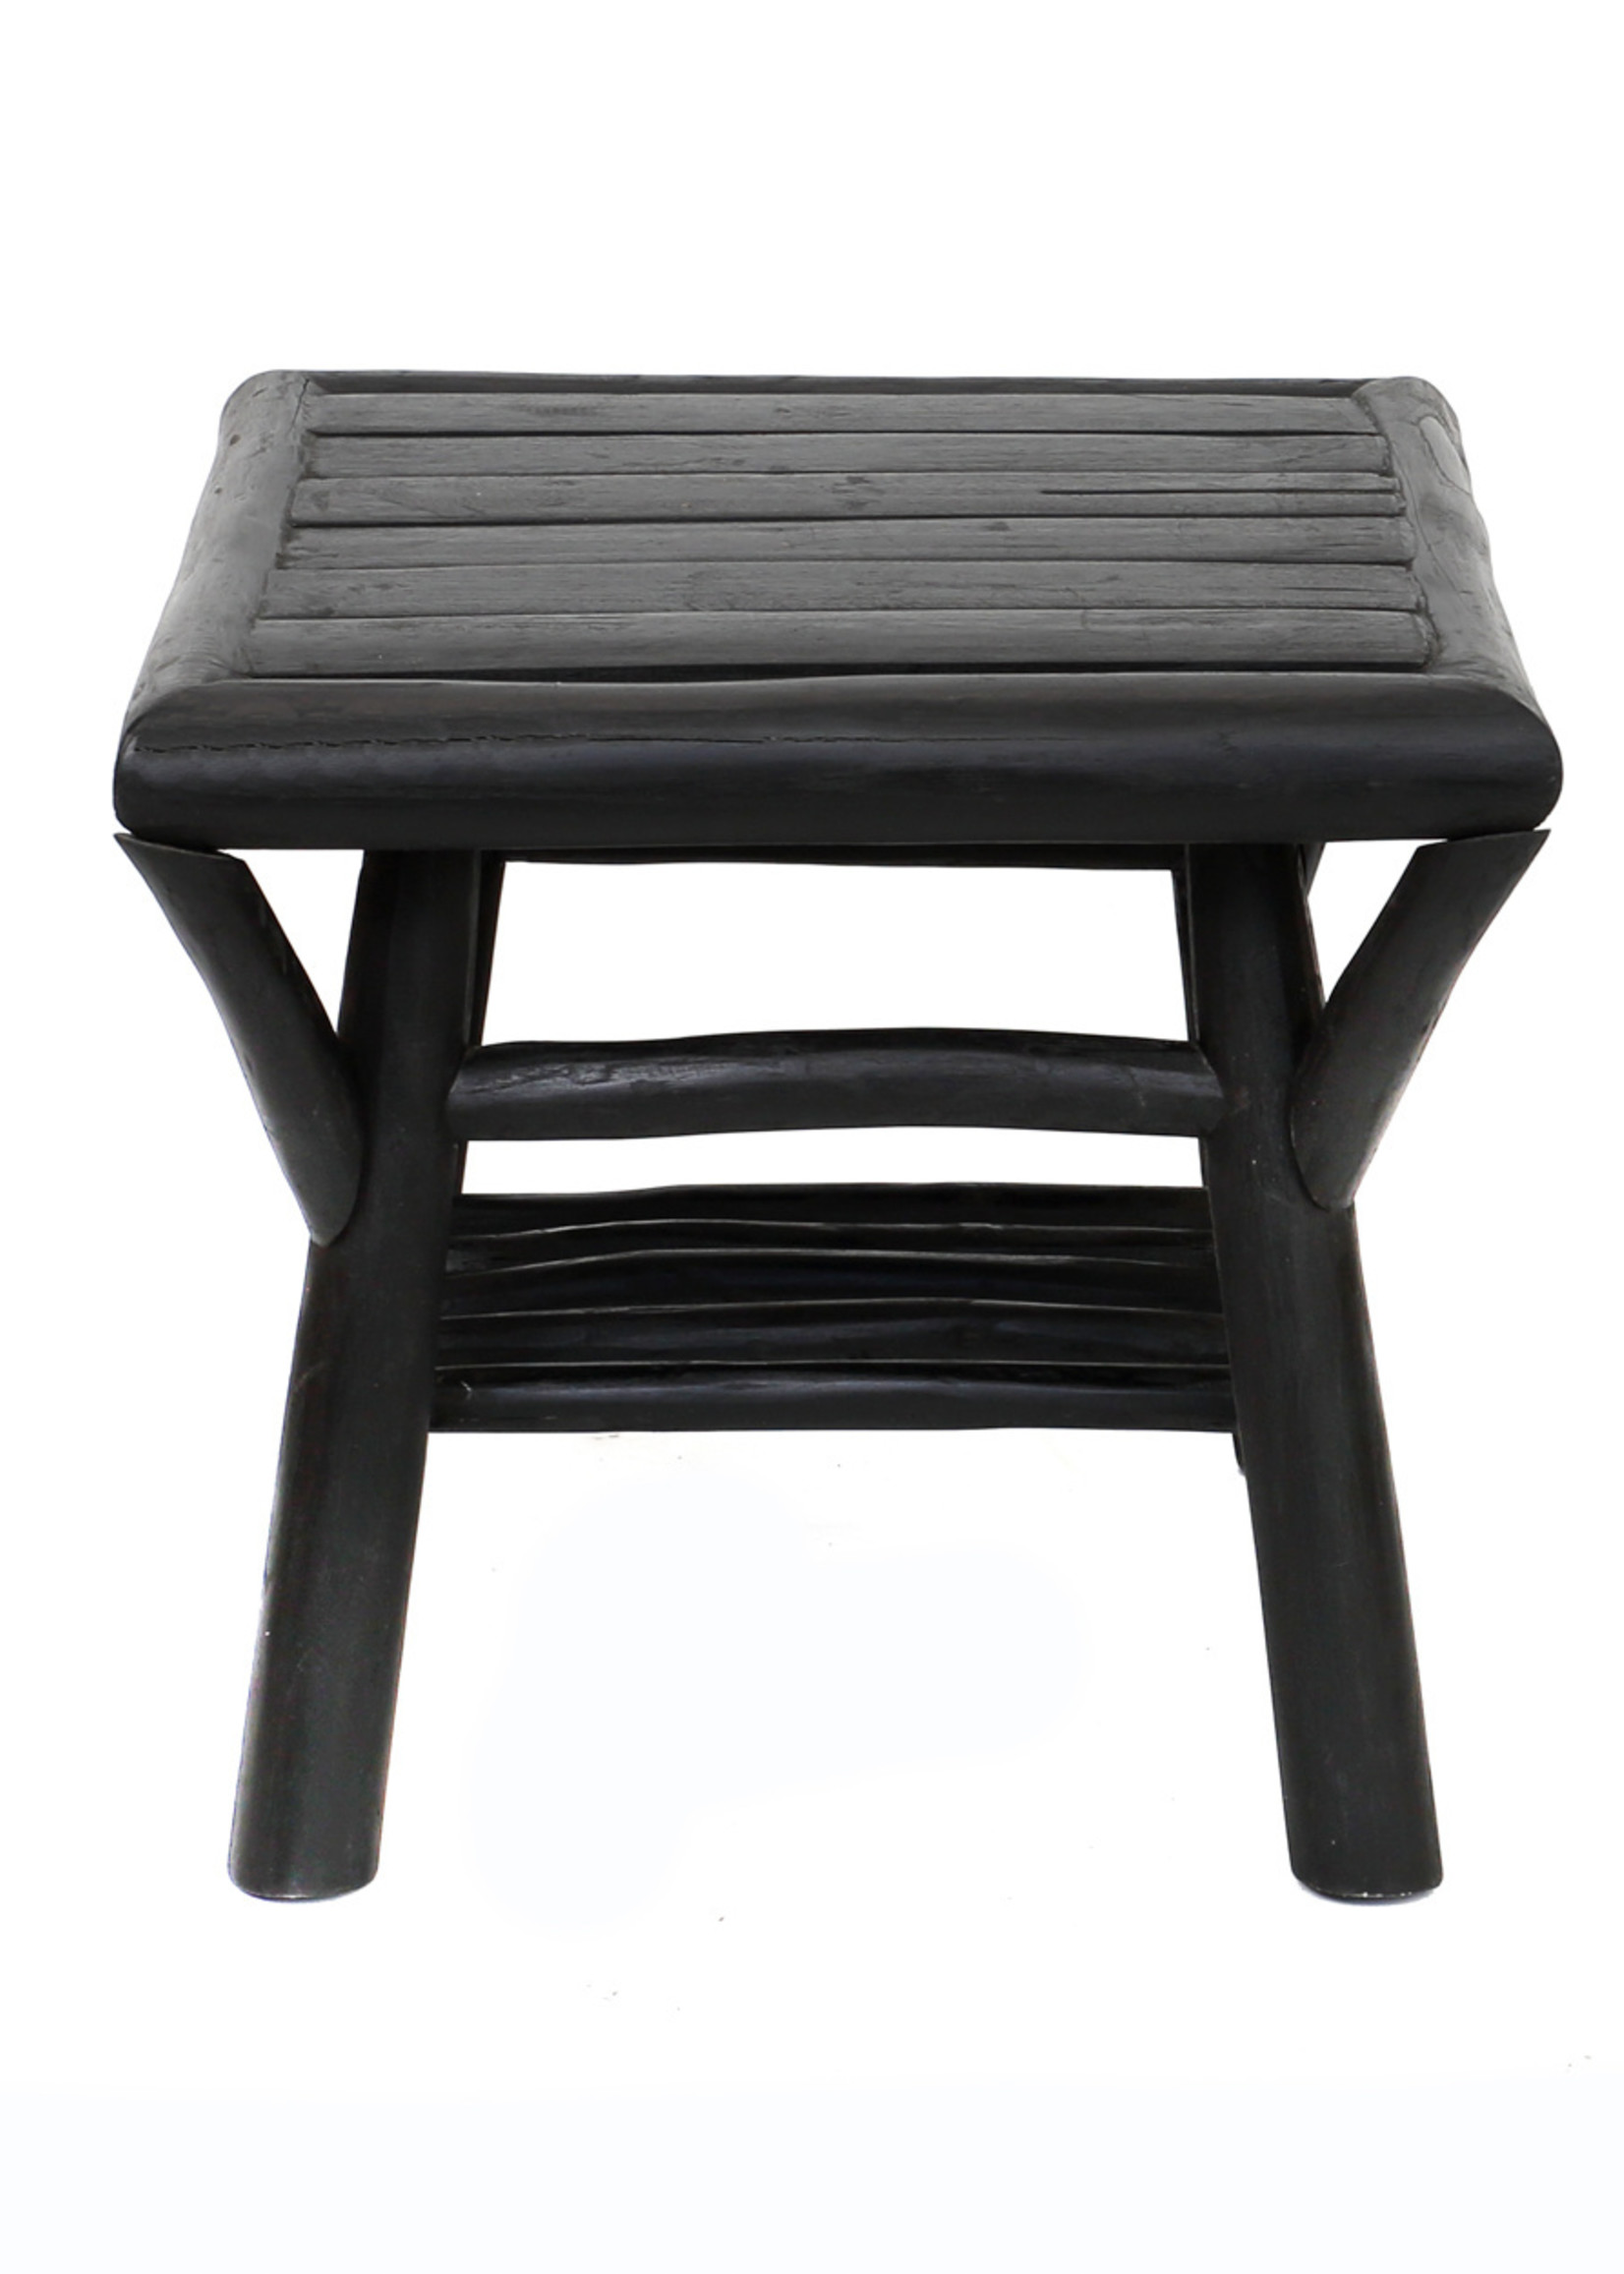 The Tulum Side Table - Black